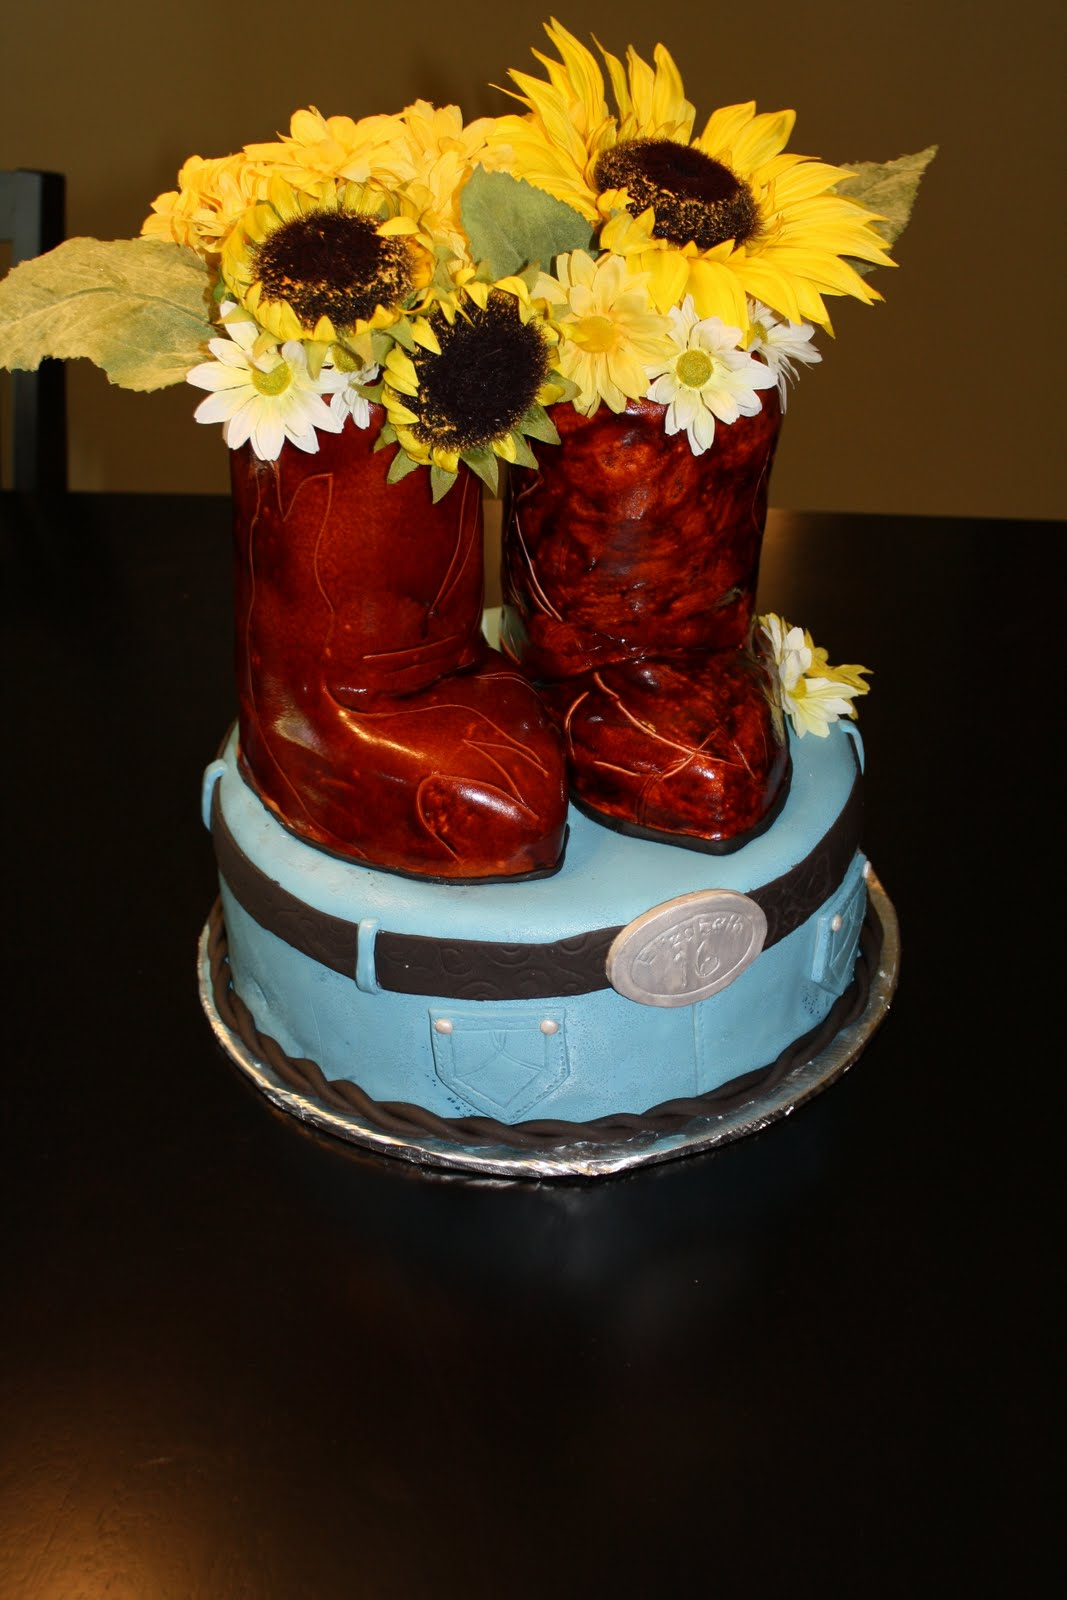 Sensational 10 Best Country Music Birthday Cakes Photo Country Grooms Cake Funny Birthday Cards Online Elaedamsfinfo